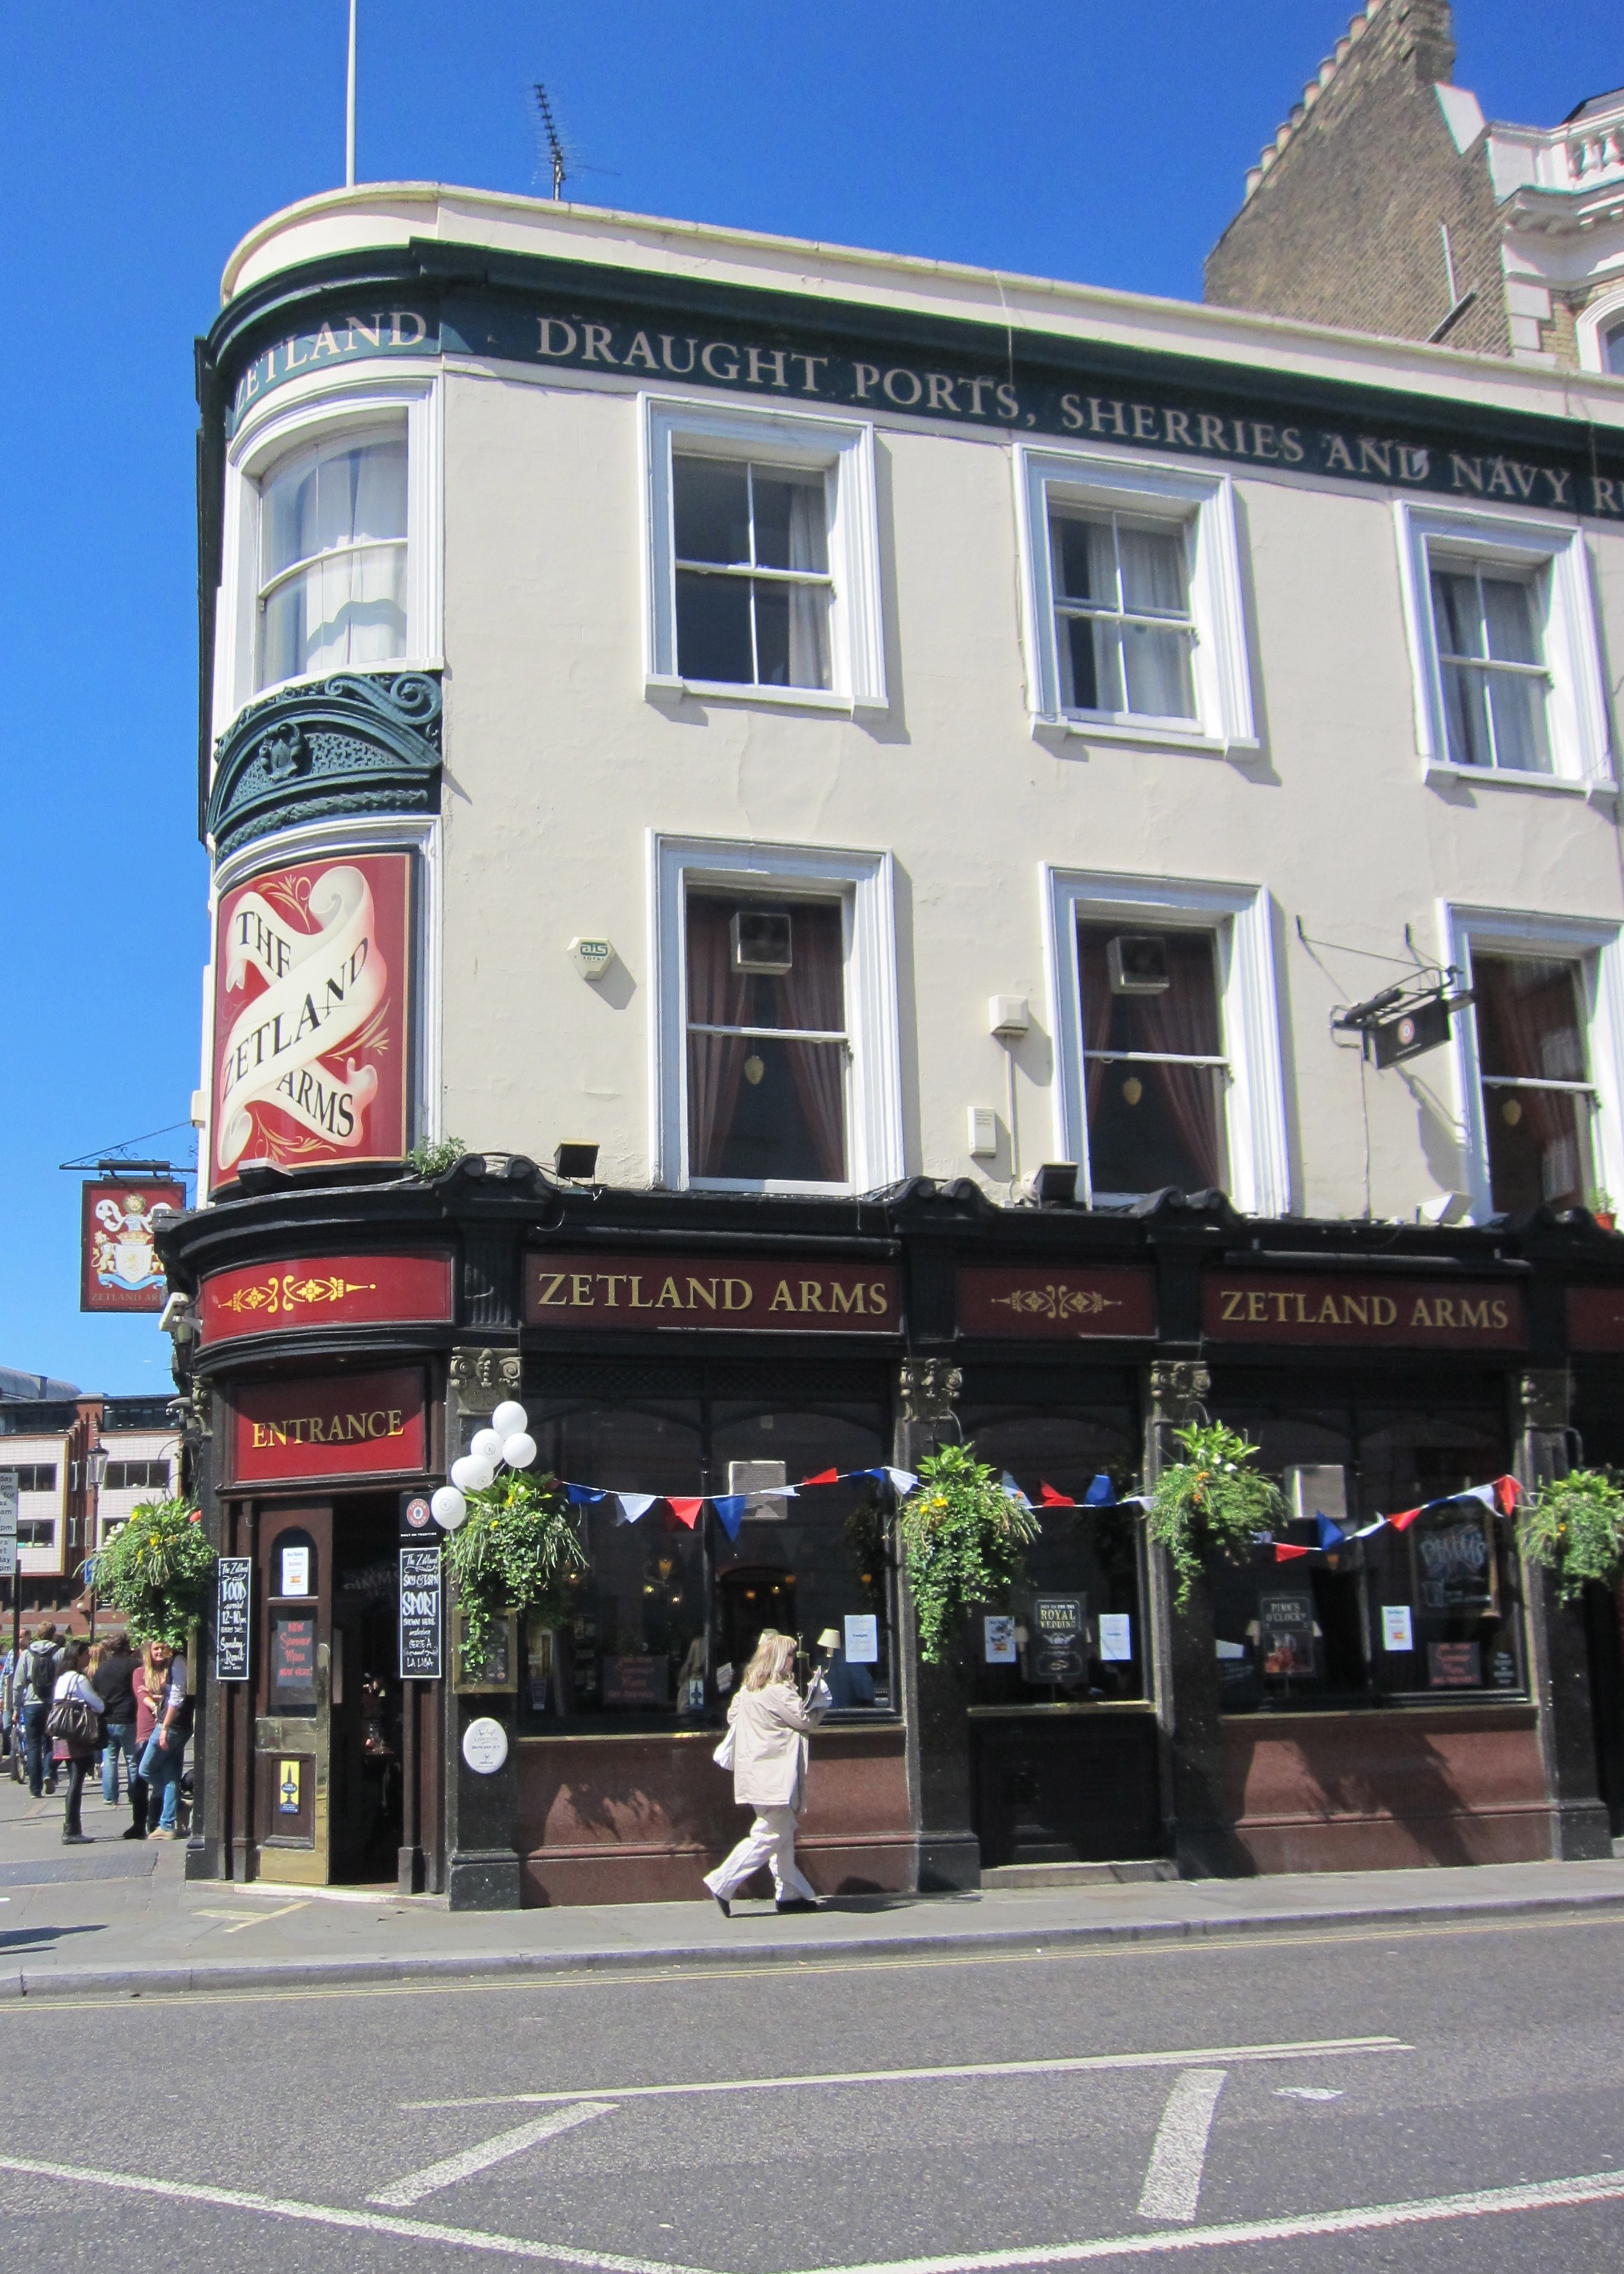 London pub, Royal wedding